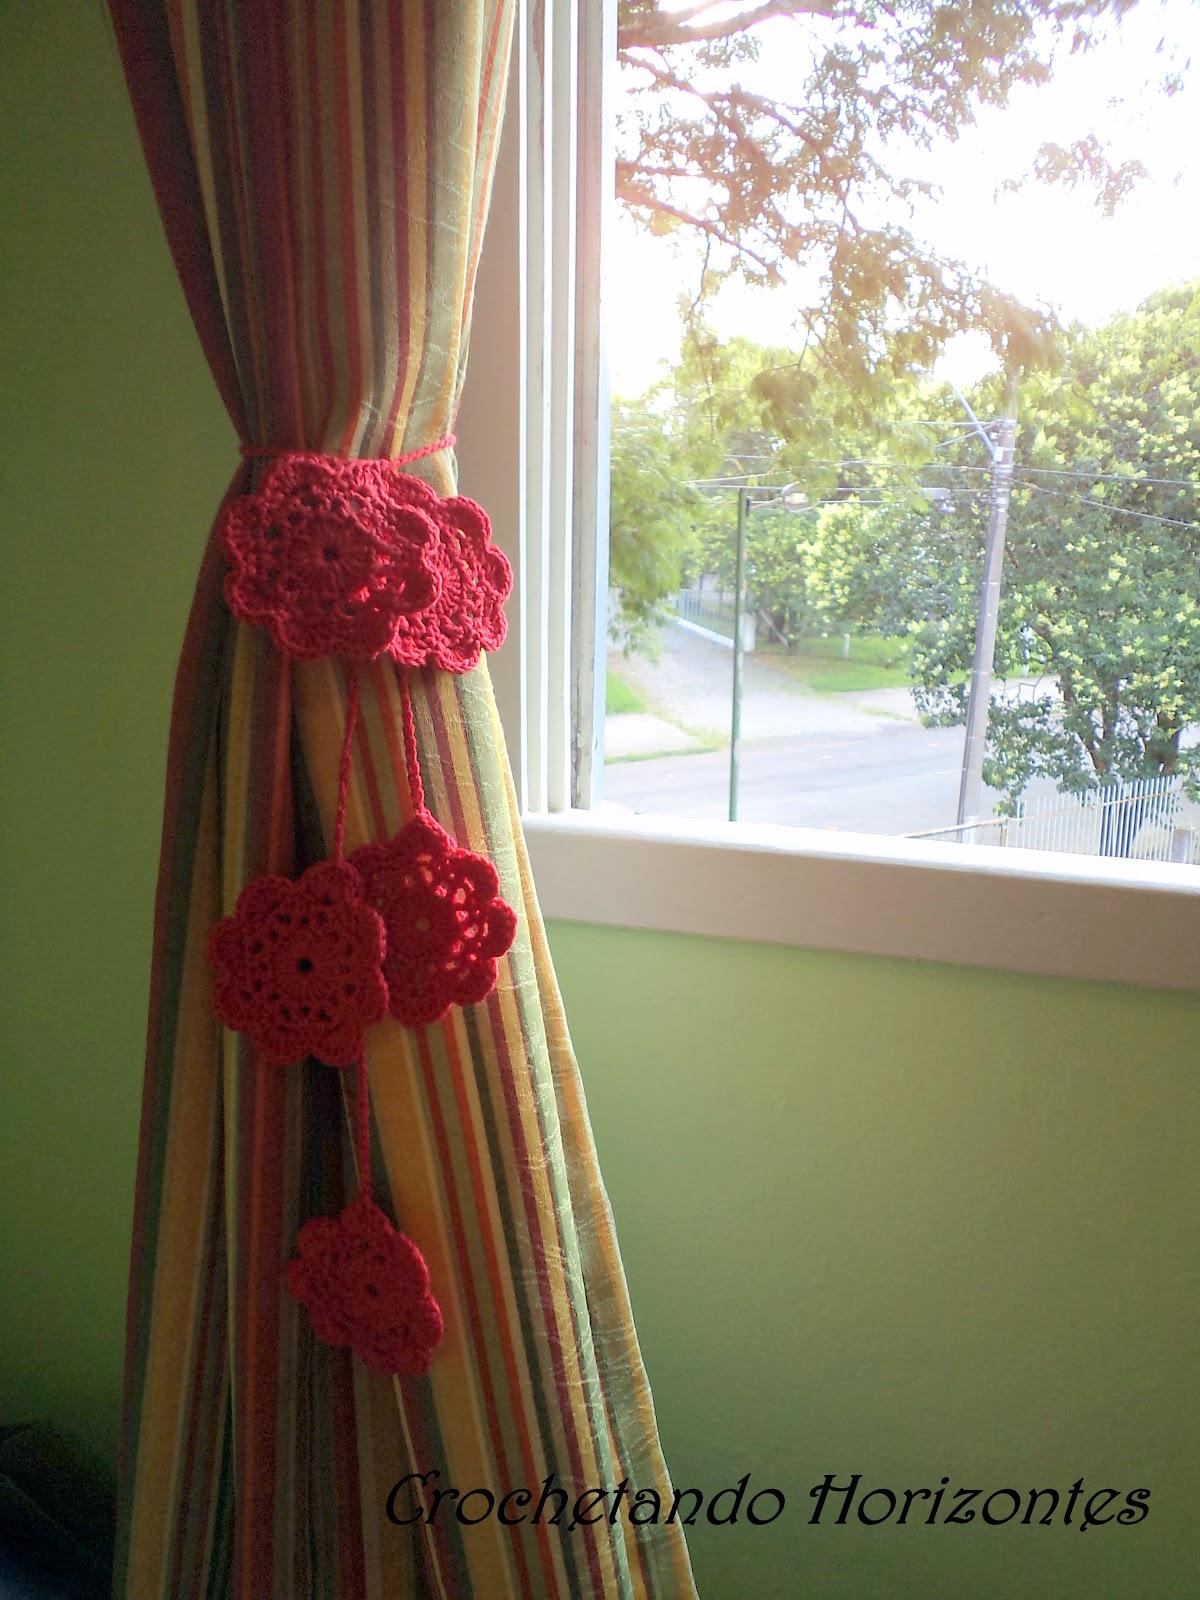 Crochetando Horizontes Novembro 2012